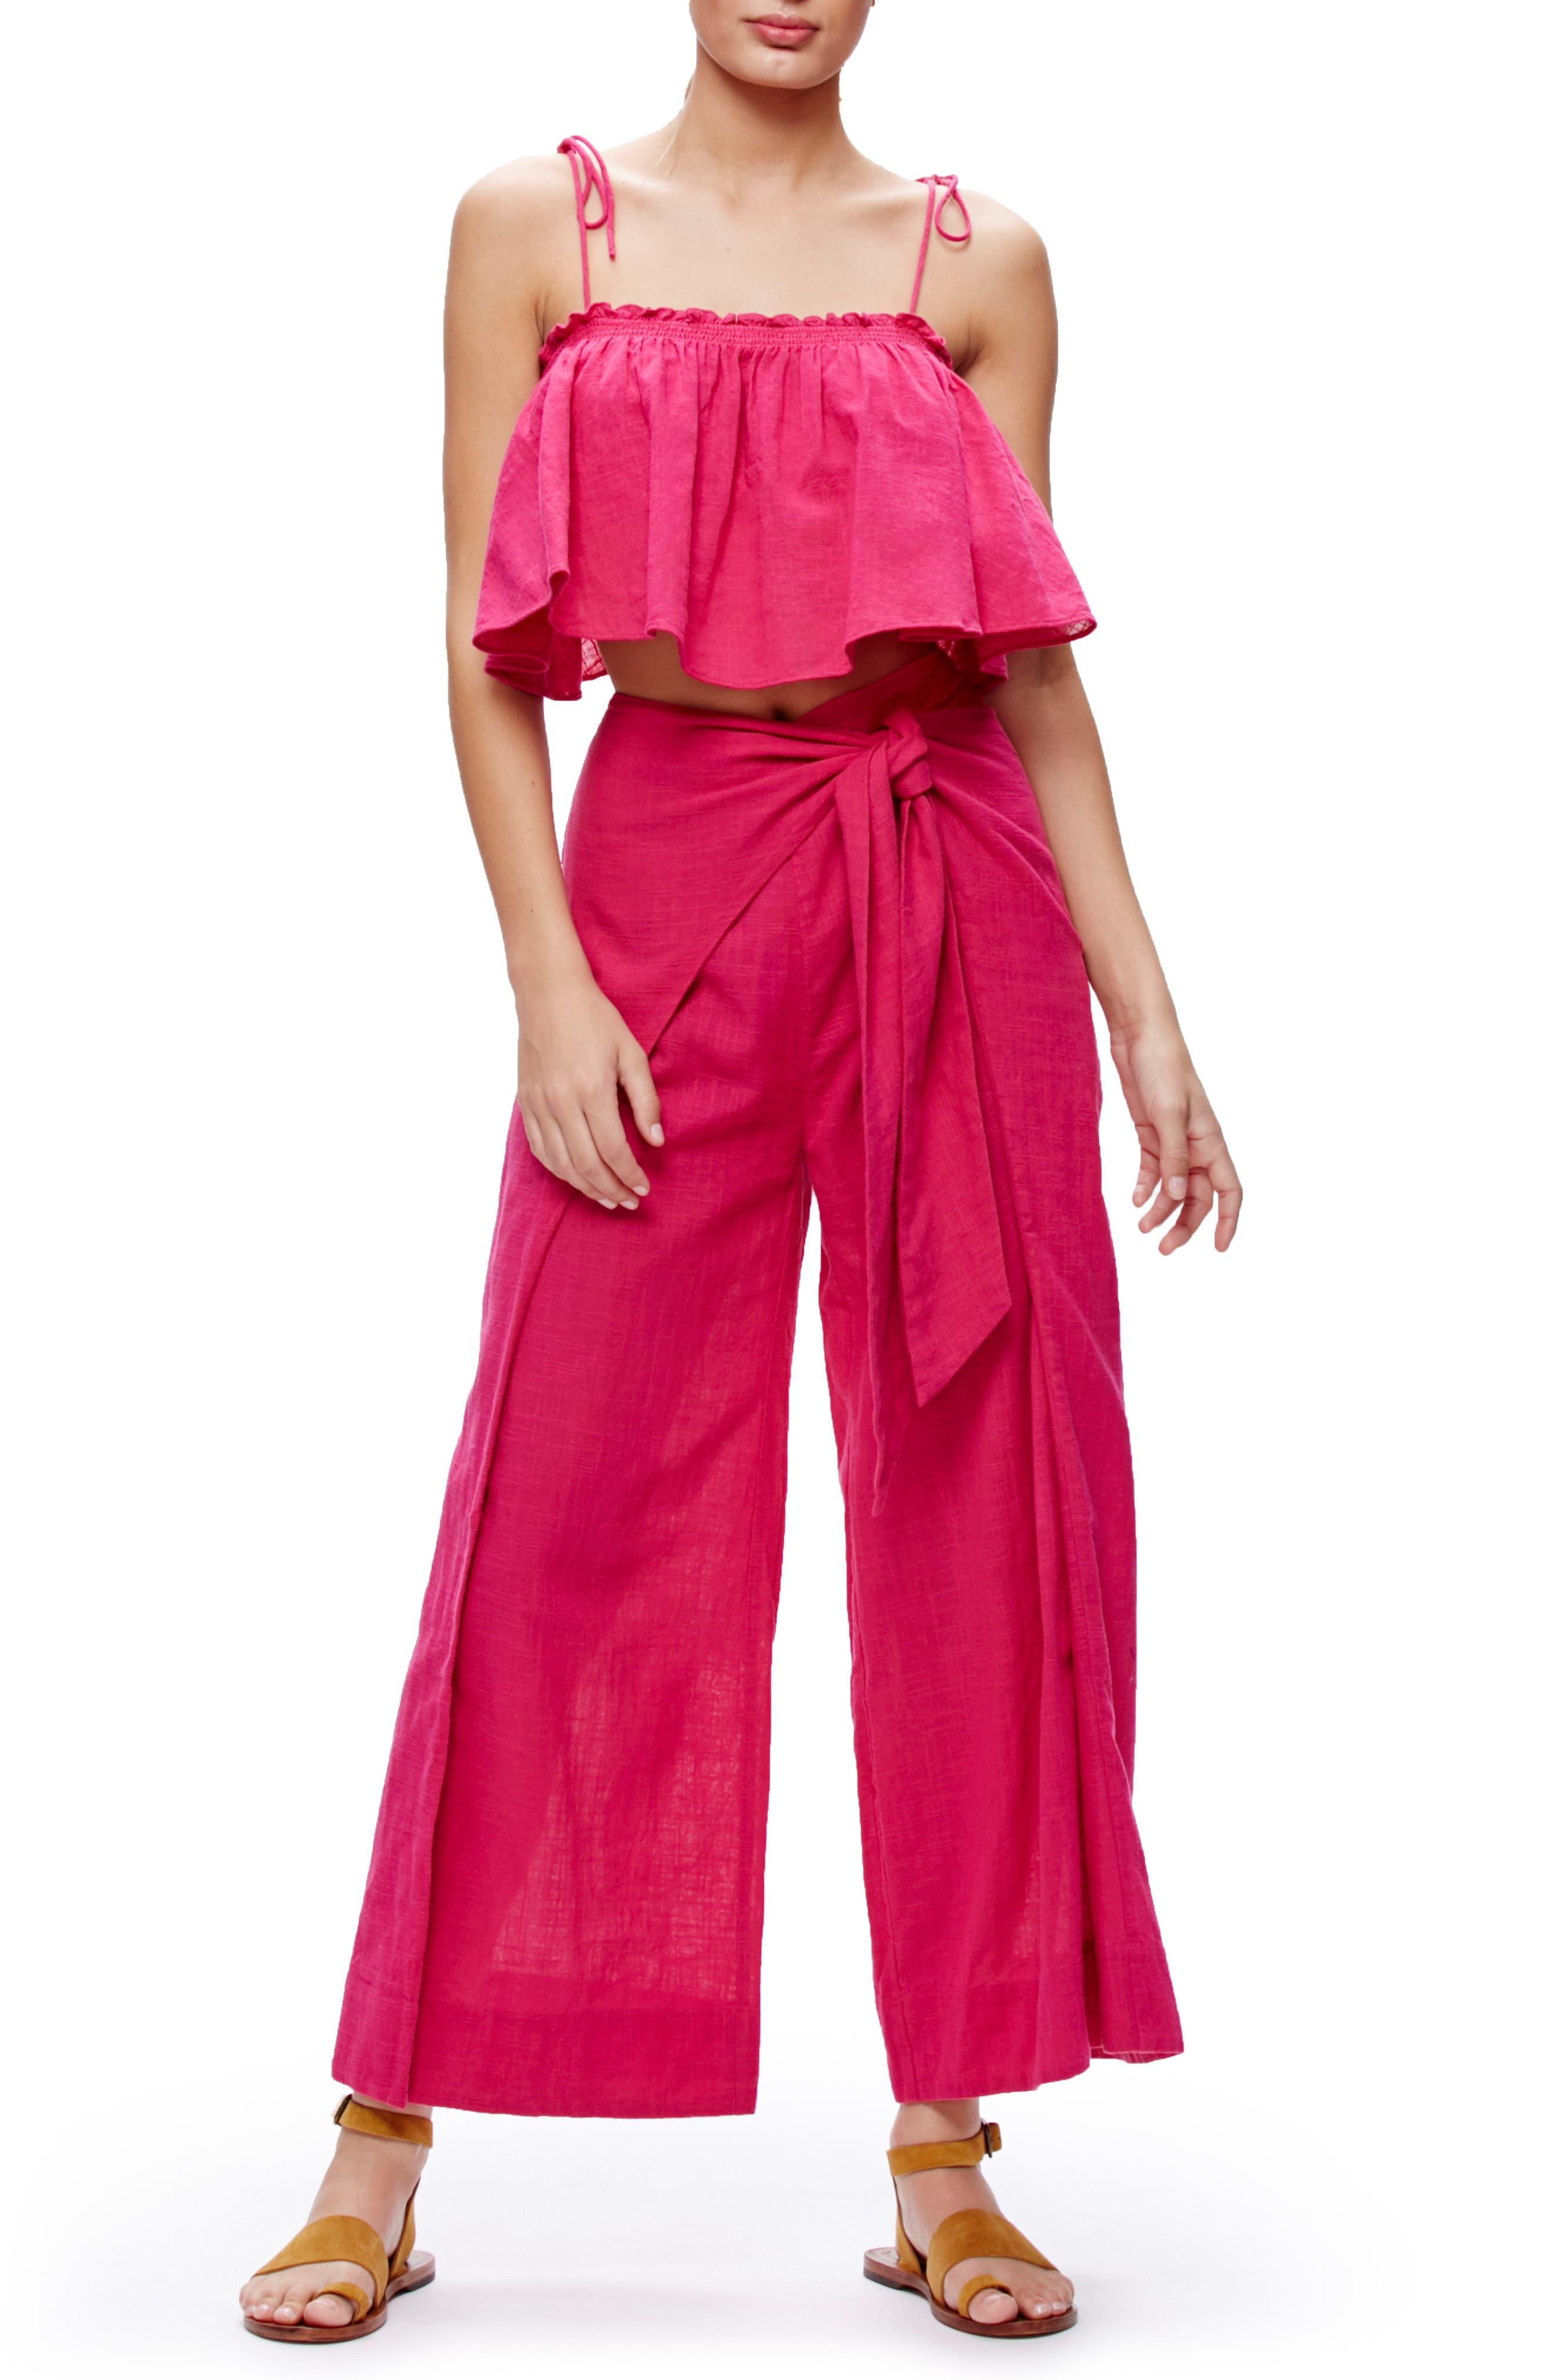 Main Image - Free People Tropic Babe Crop Top & High Waist Pants Set